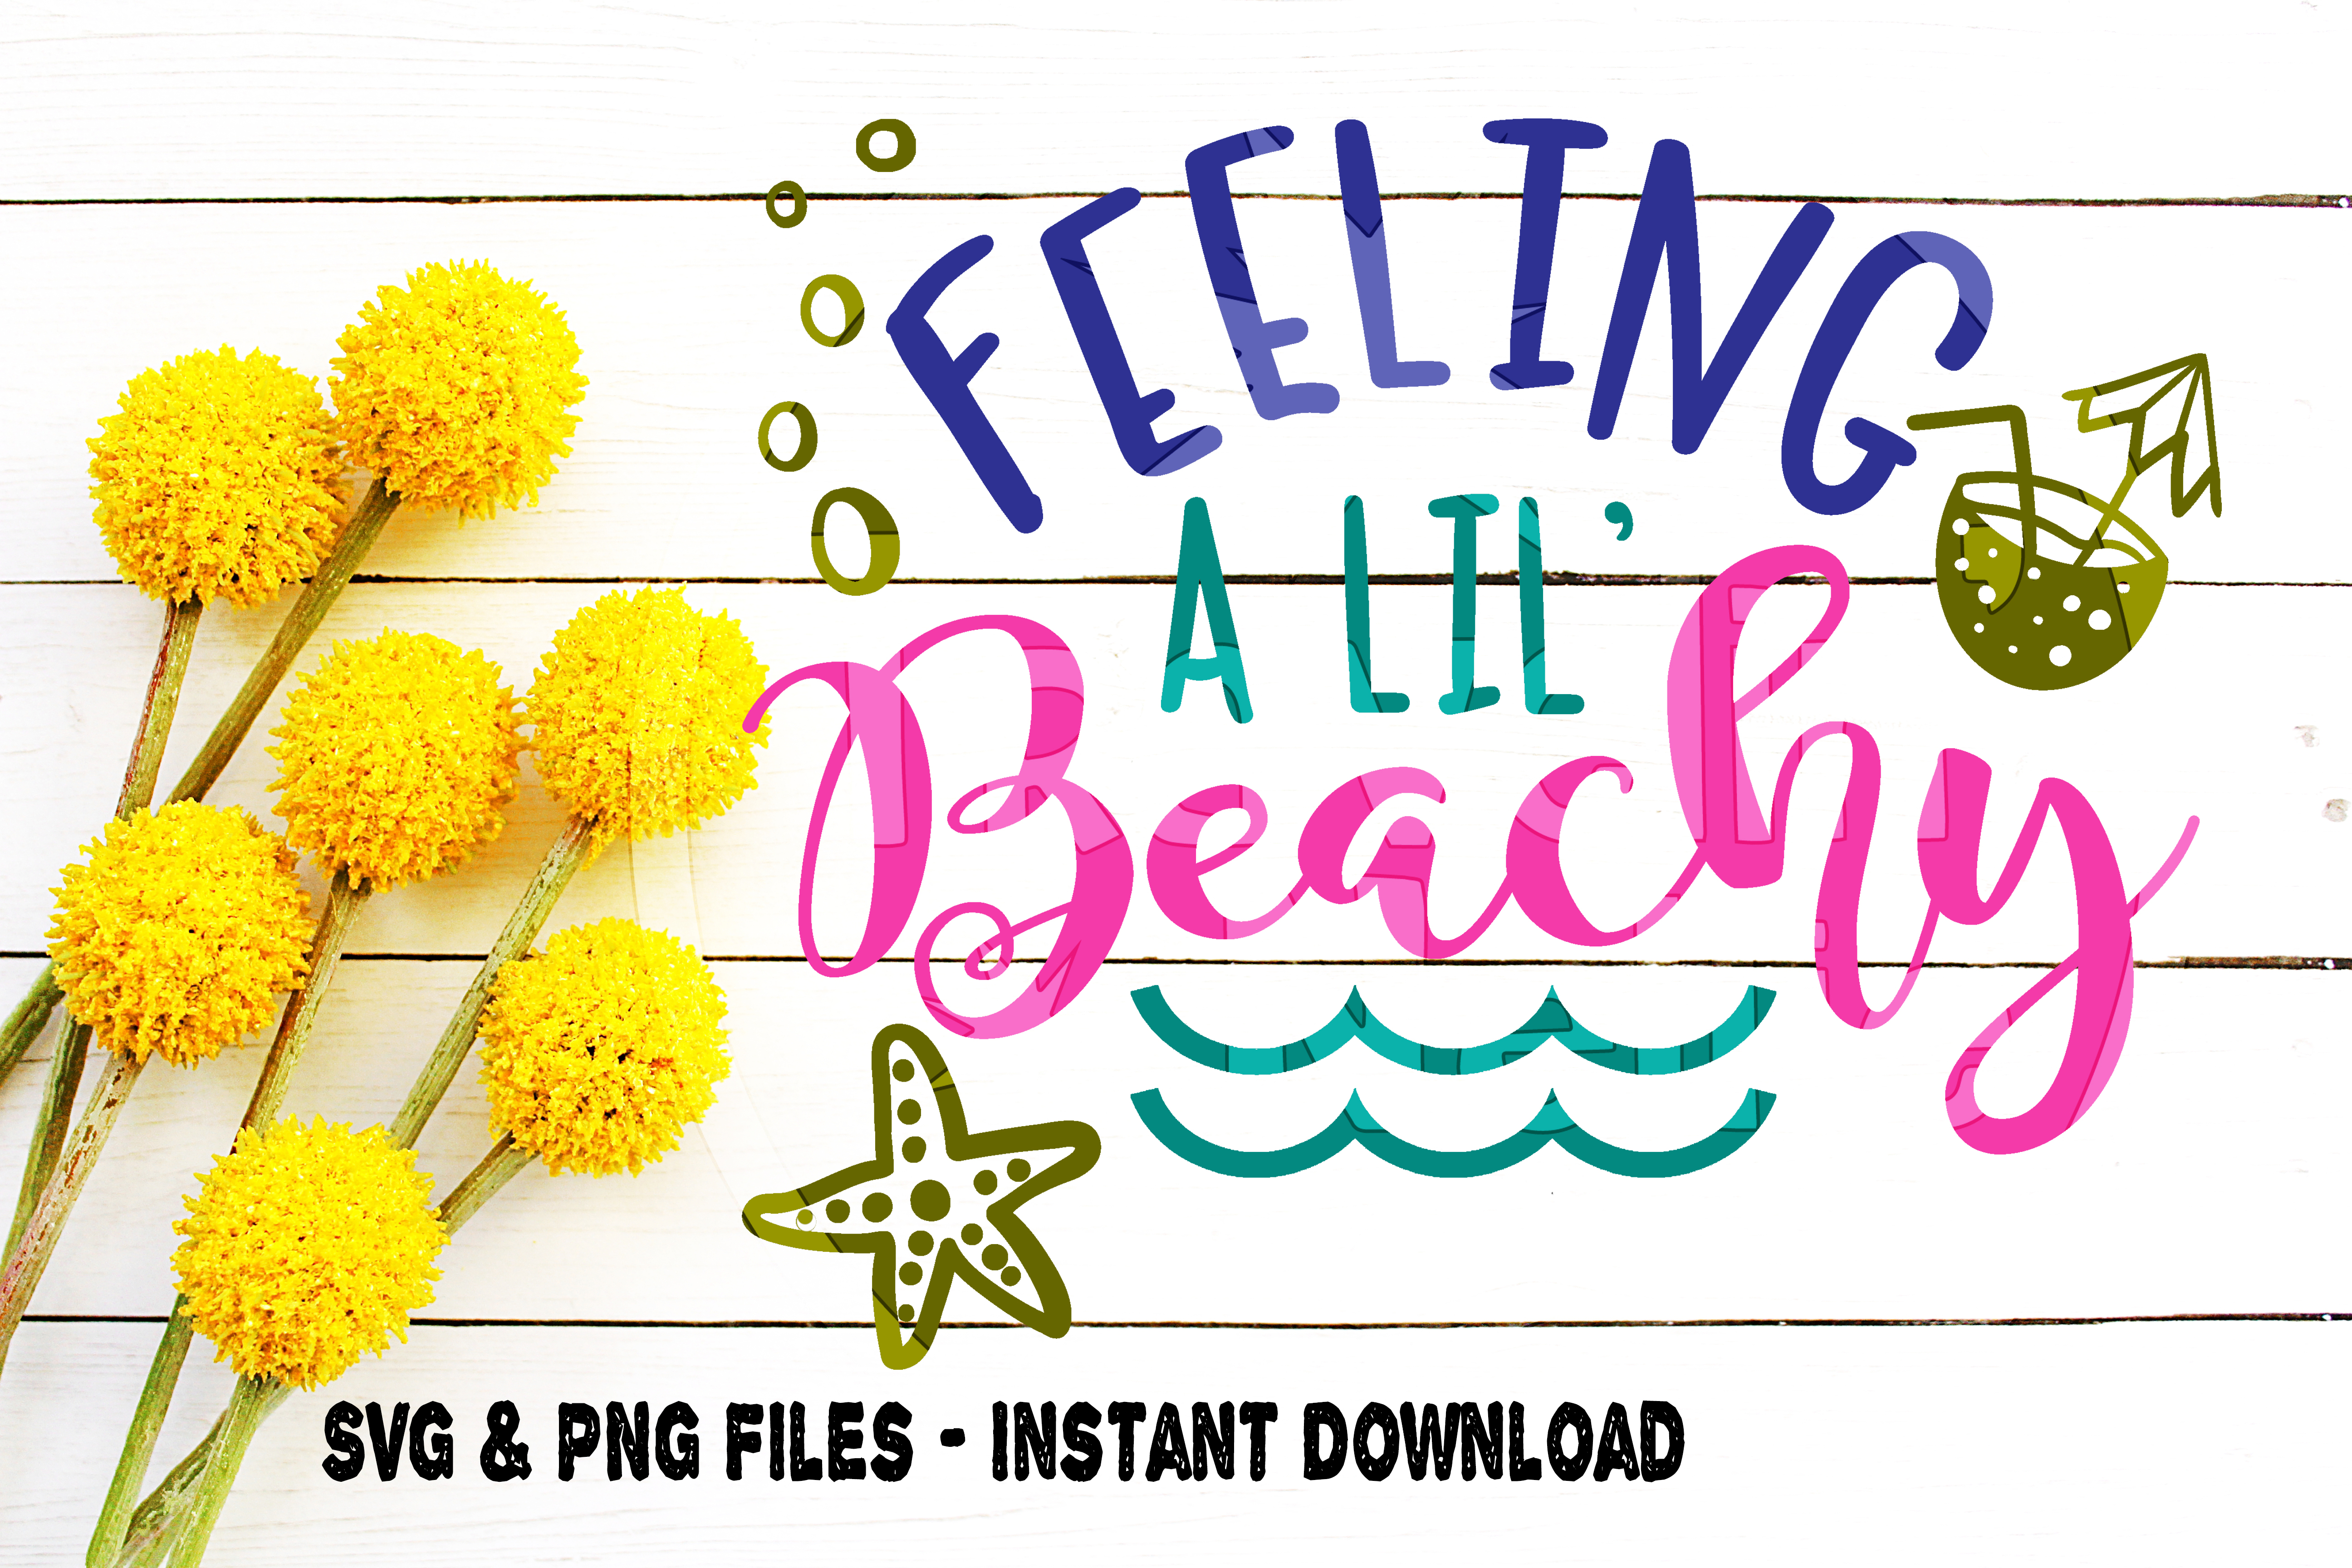 SVG Beach Bundle, 4, Beach Moods svg, Emotions svg, Feeling Nauti svg, Feeling Beachy svg, Feeling Jelly svg, Feeling Salty svg, Cut File example image 5